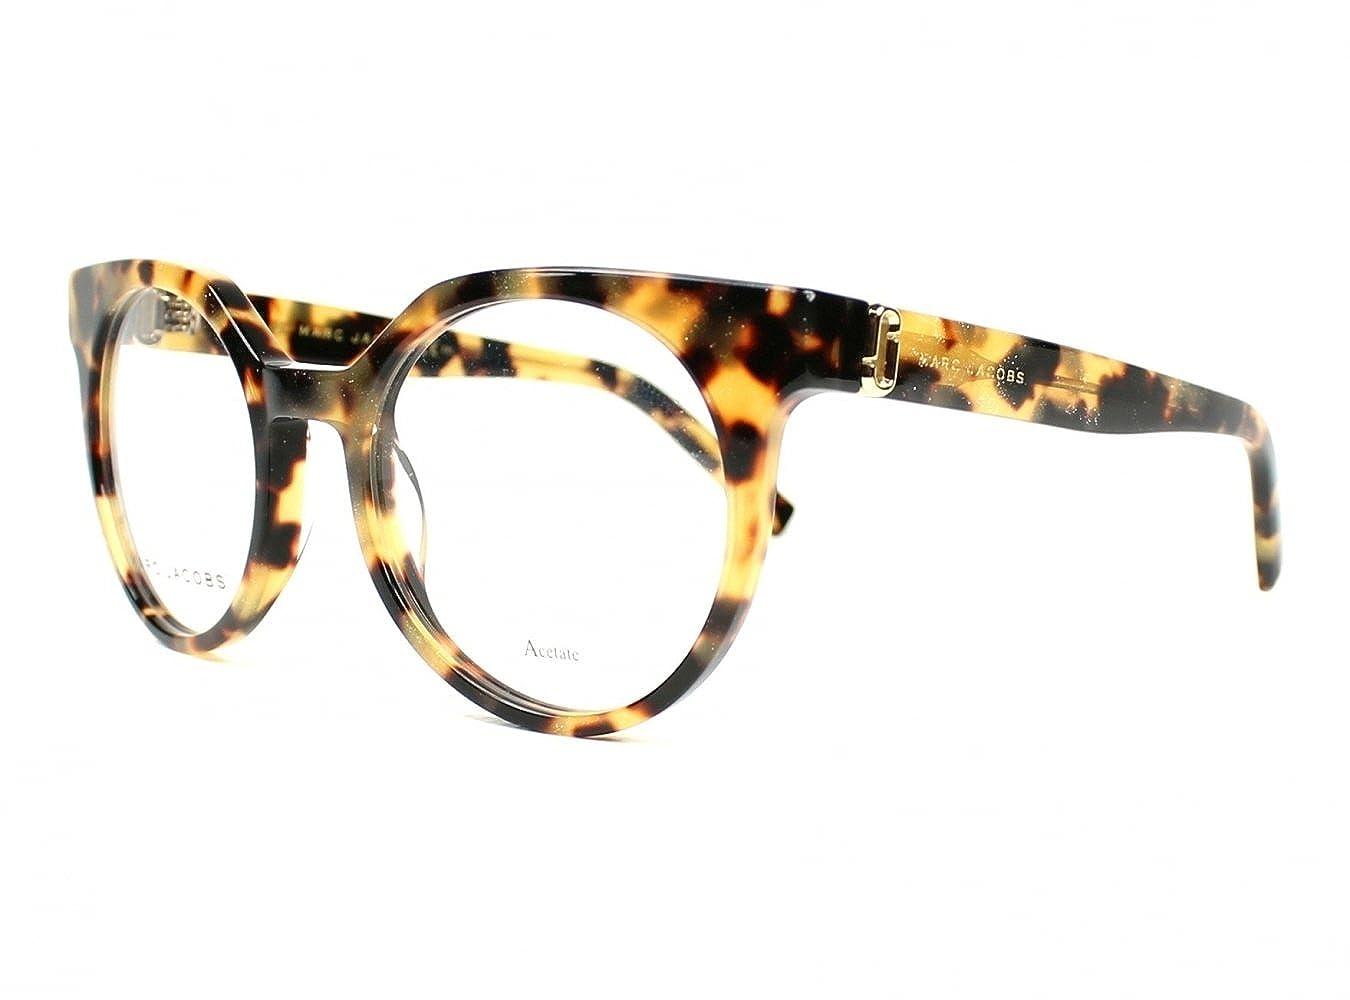 3aff92fb52 Amazon.com: Optical frame Marc Jacobs Acetate Glitter Havana (MARC ...